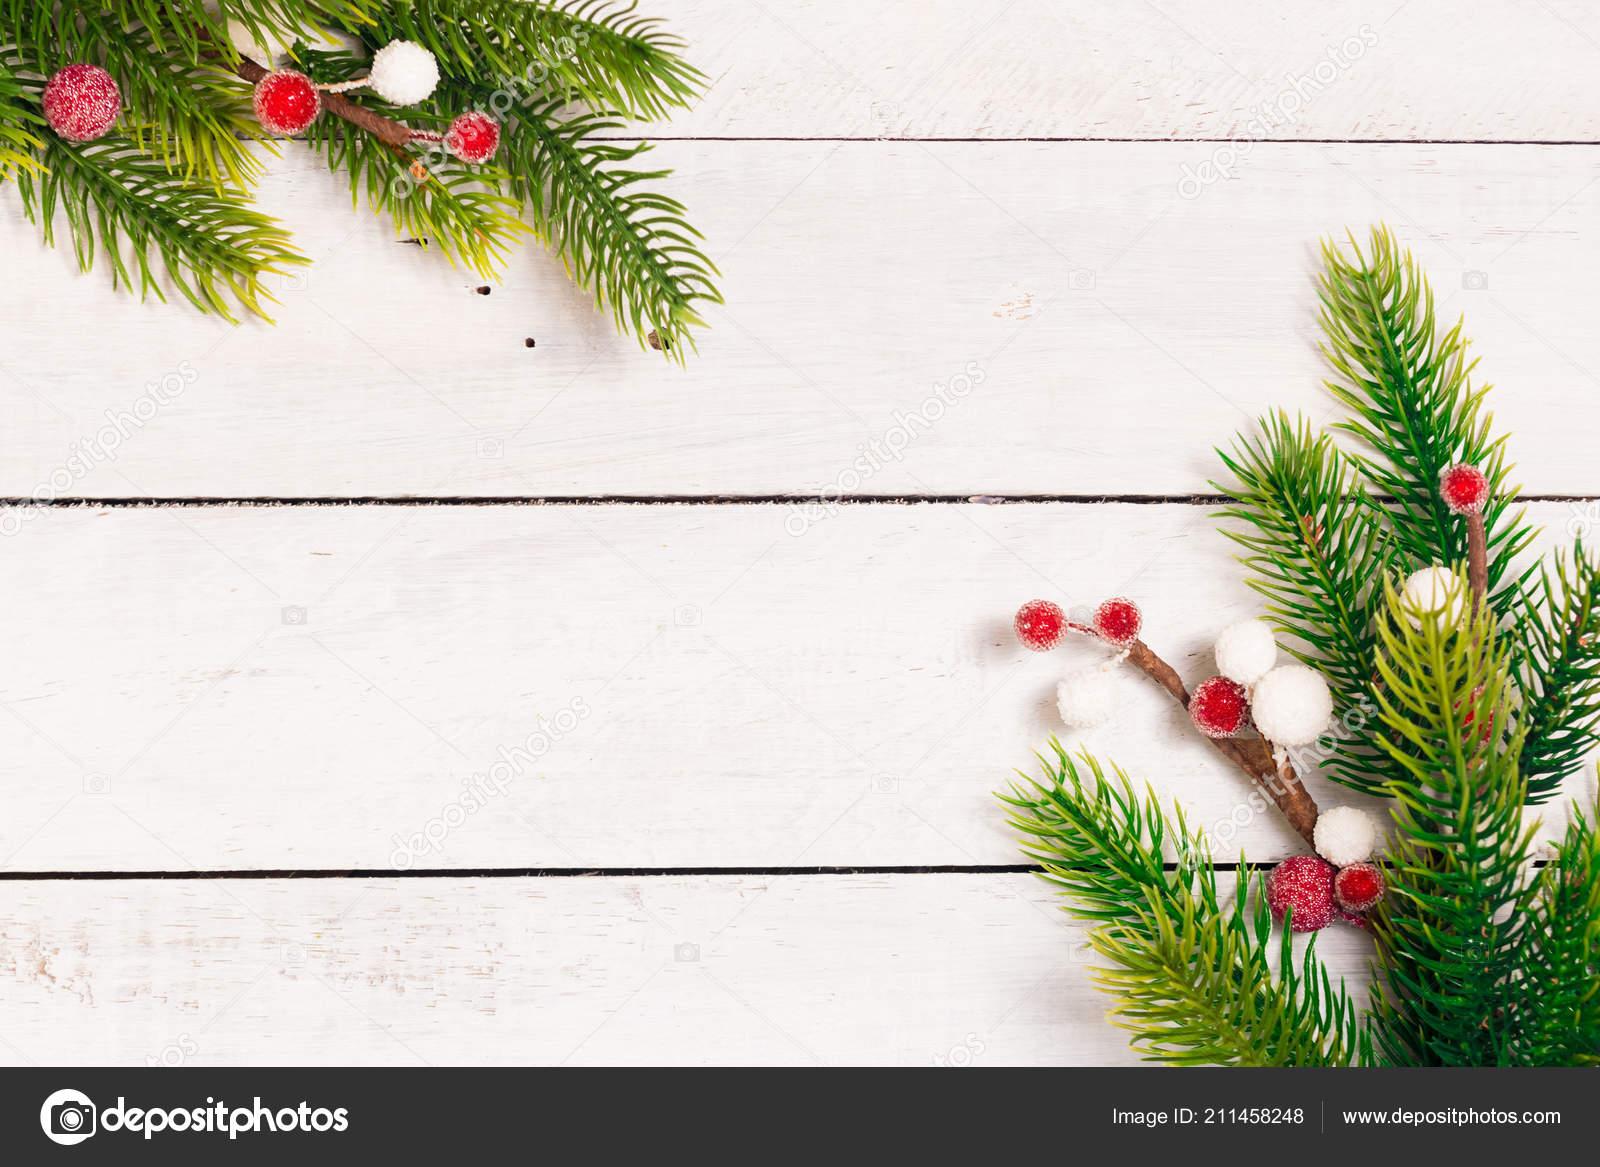 Branches Sapin Noel Avec Decoration Differente Tranches Citron